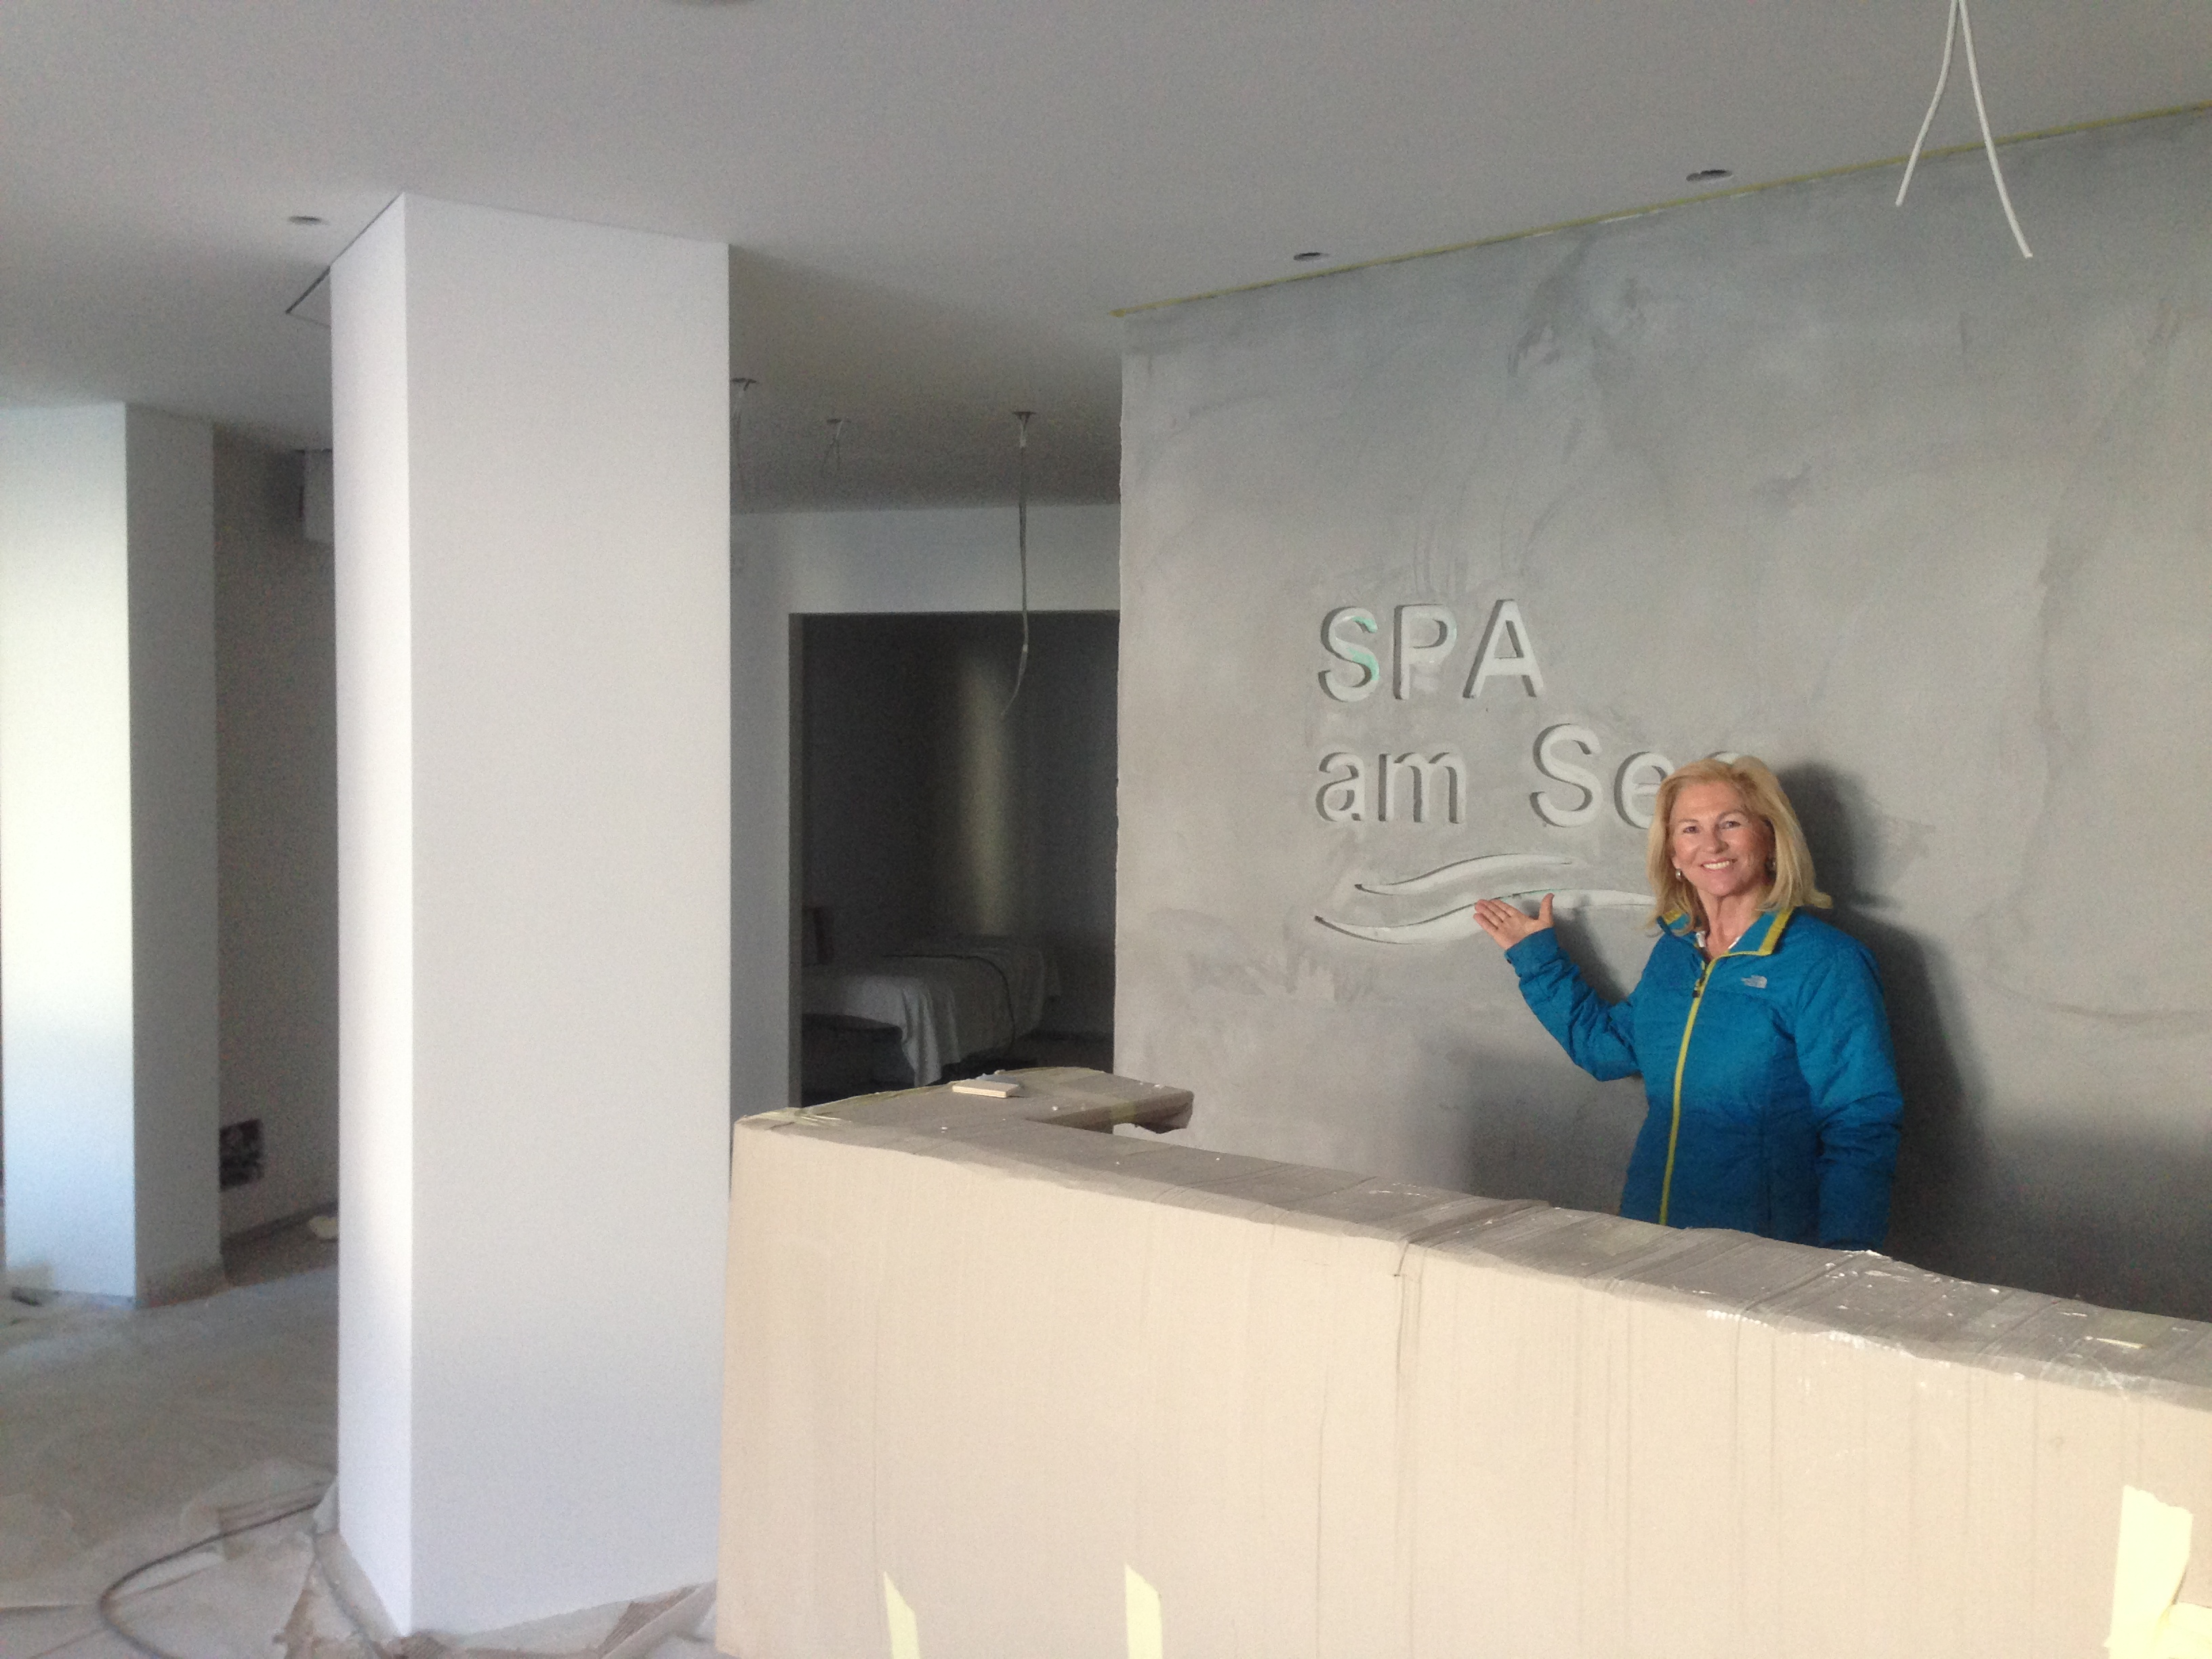 Herzlich Willkommen im neuen SPA AM SEE - Frau De Carli an der Beauty-Rezeption...